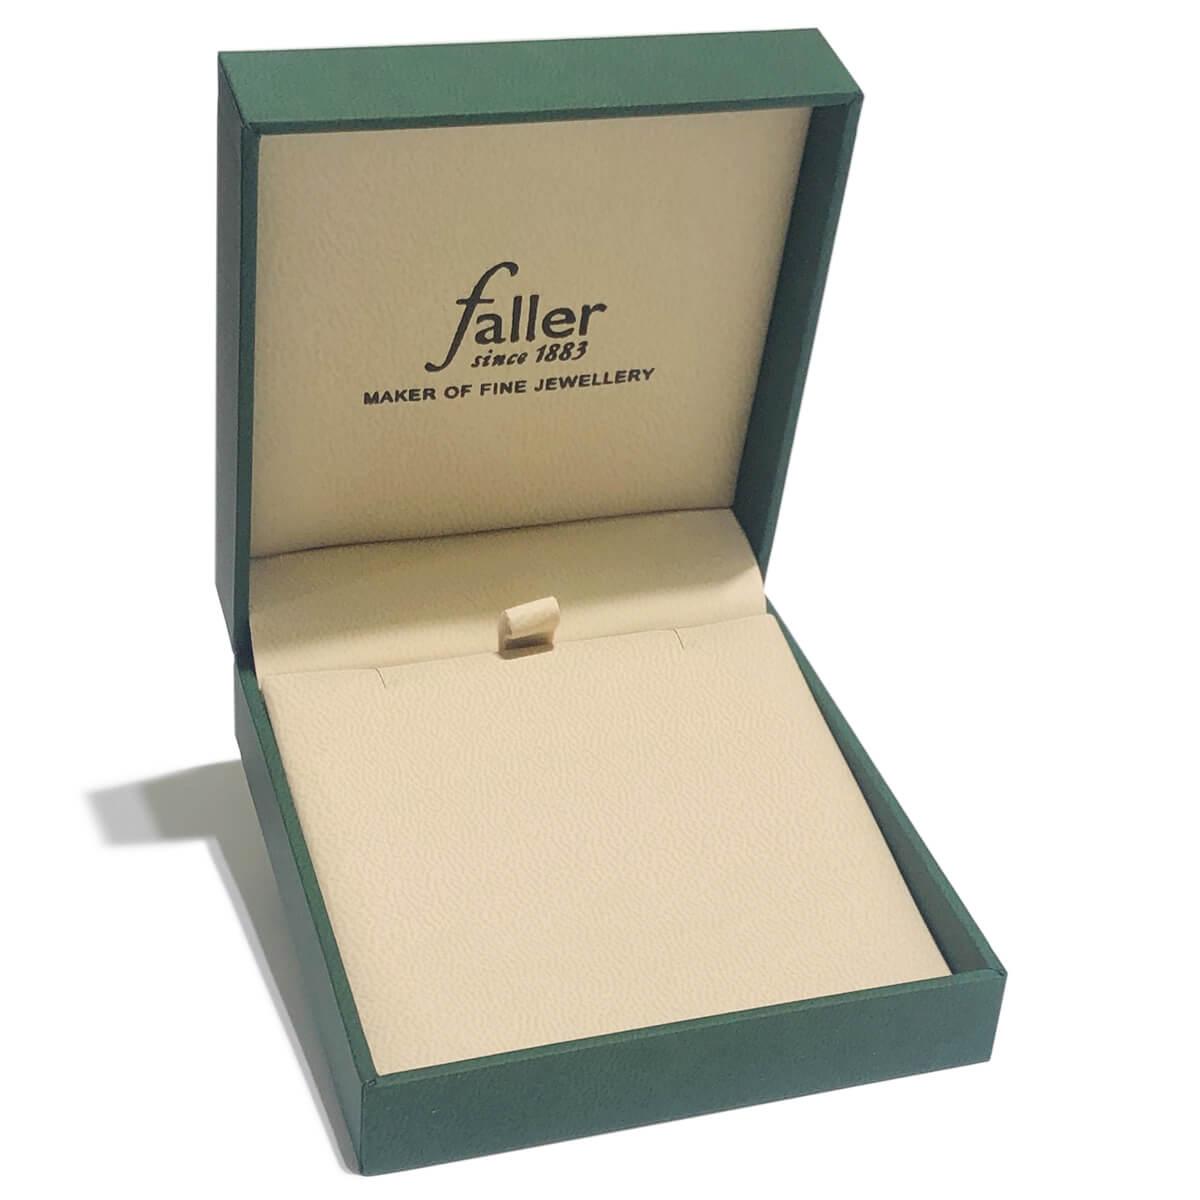 oendant box, pendant packaging, bangle box